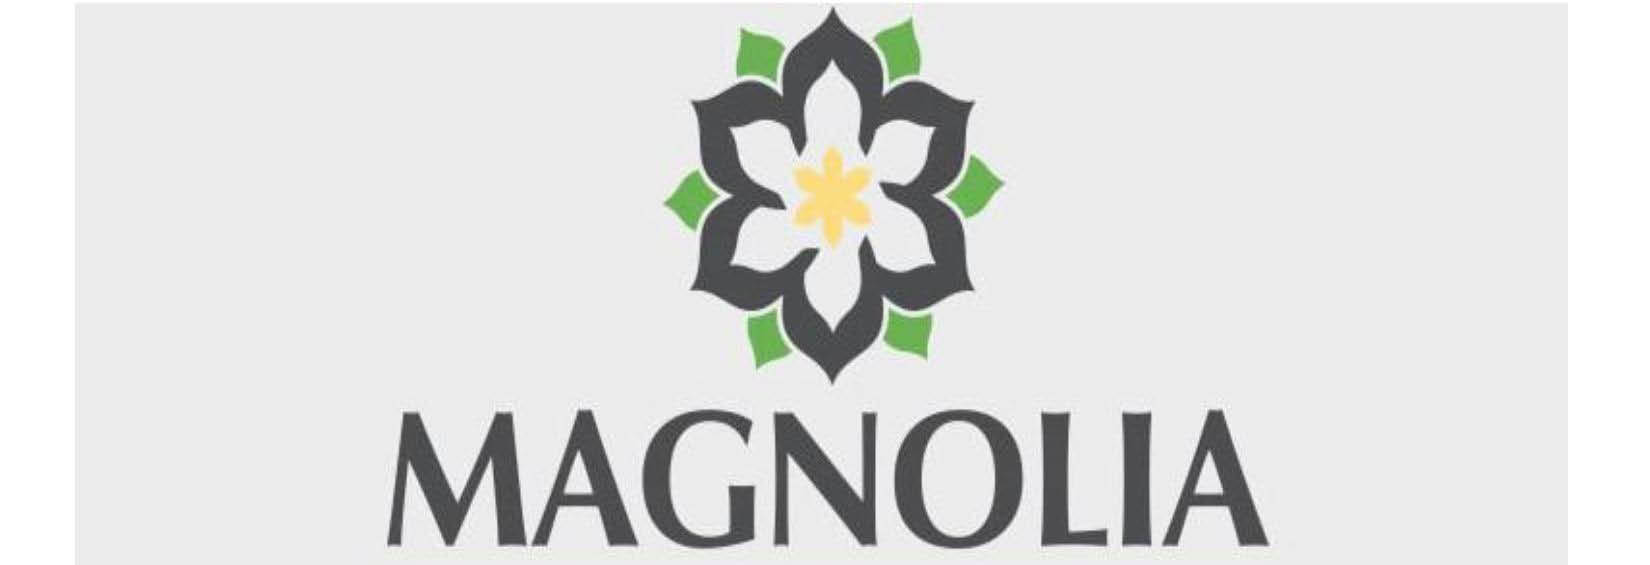 magnolia-family-dental-mckinney-tx-logo